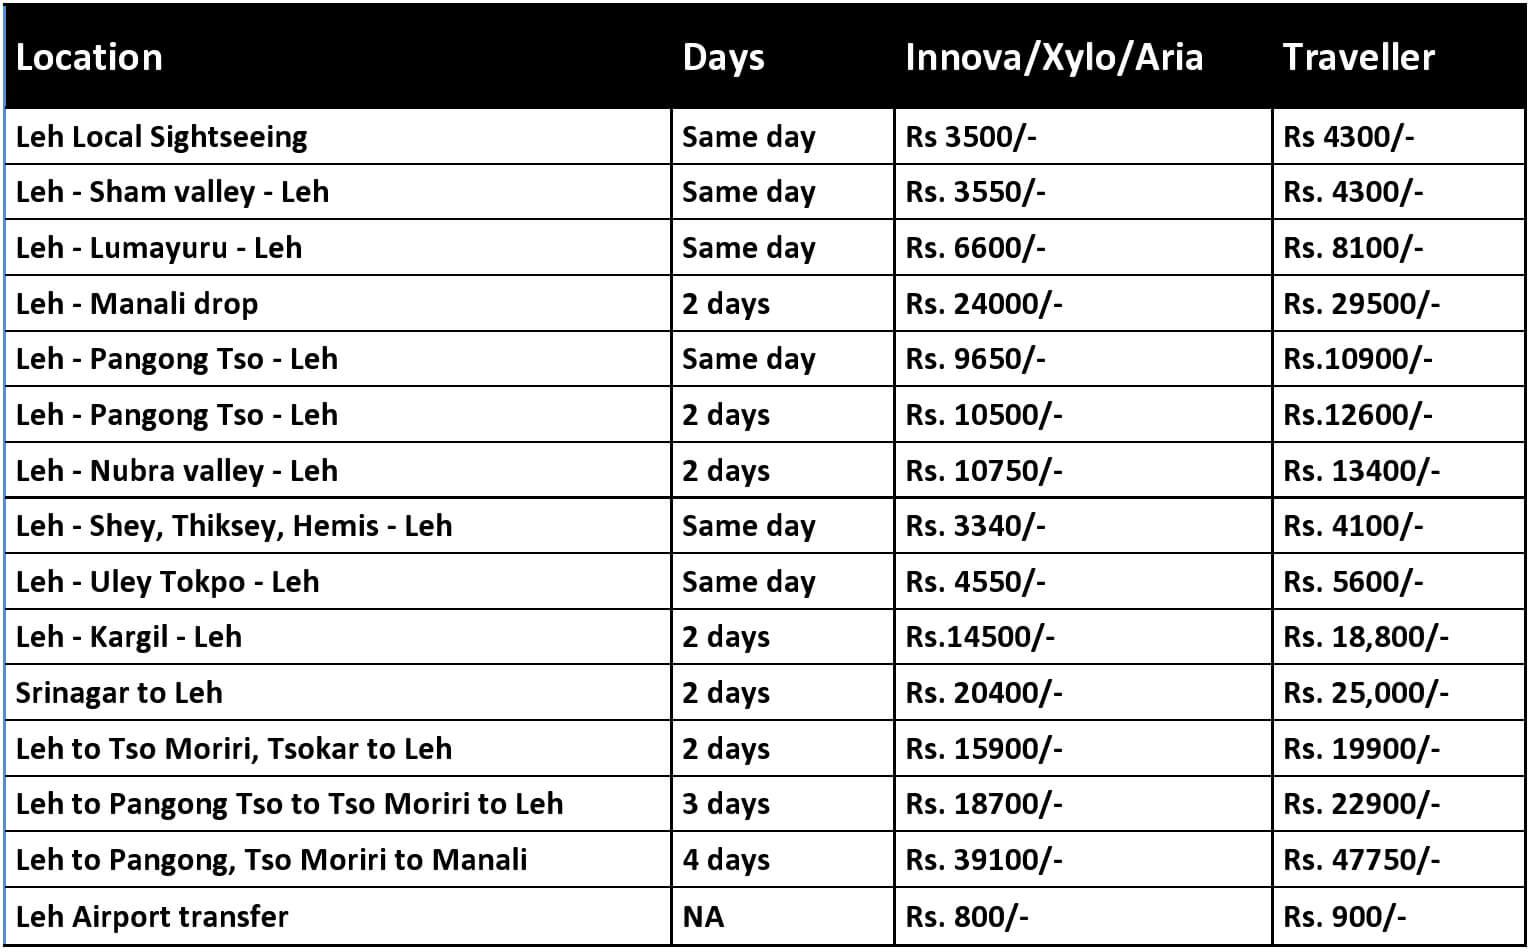 Leh Taxi Rates 2019 - BOOK YOUR TAXI - Sruti Travels